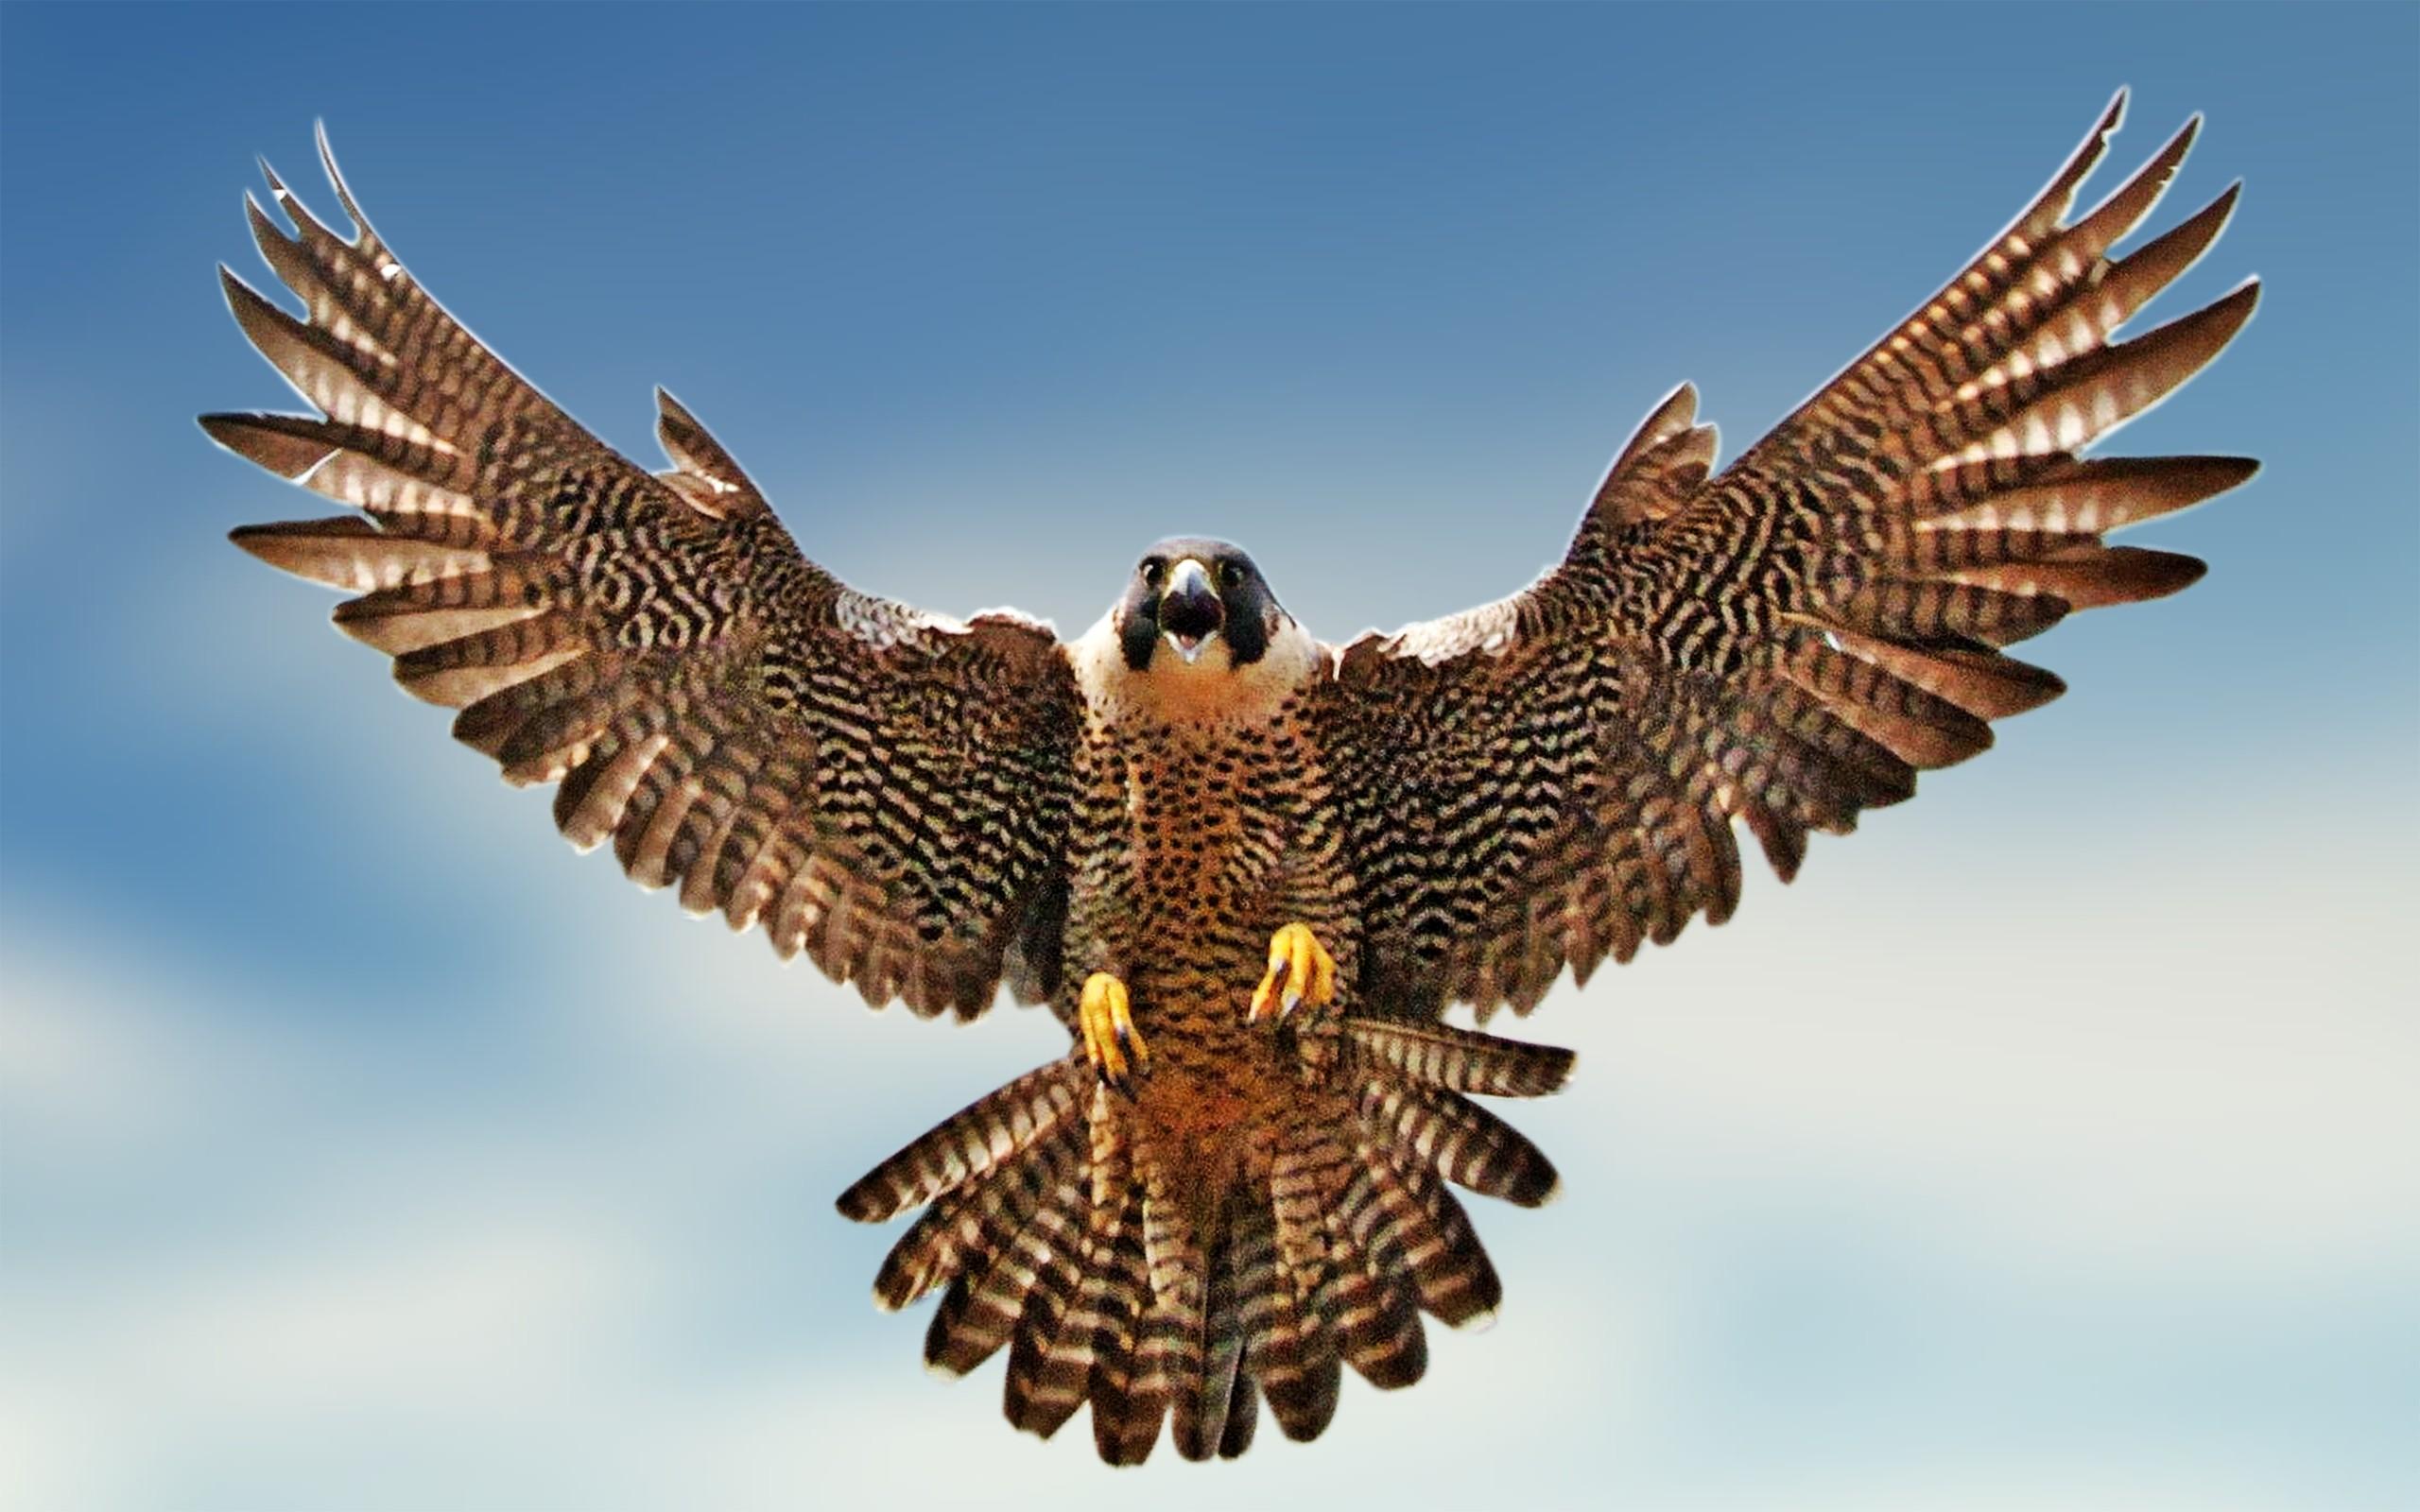 Falcon hd wallpaper background. Birds clipart falcons